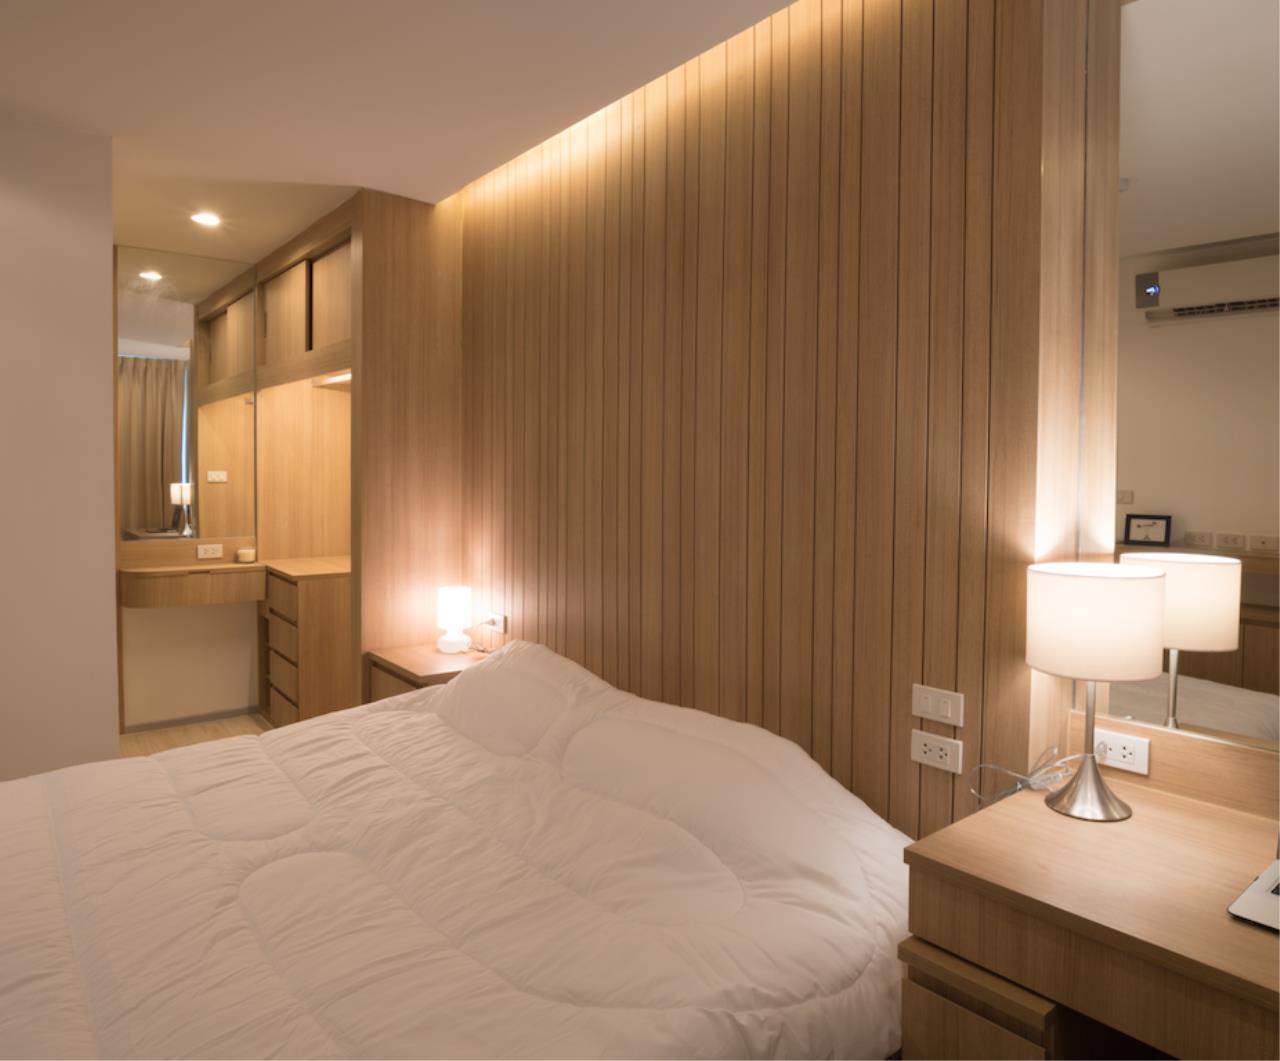 Real Estate in Pattaya Agency's 1 Bed Room - Chezz Pattaya Condo 6